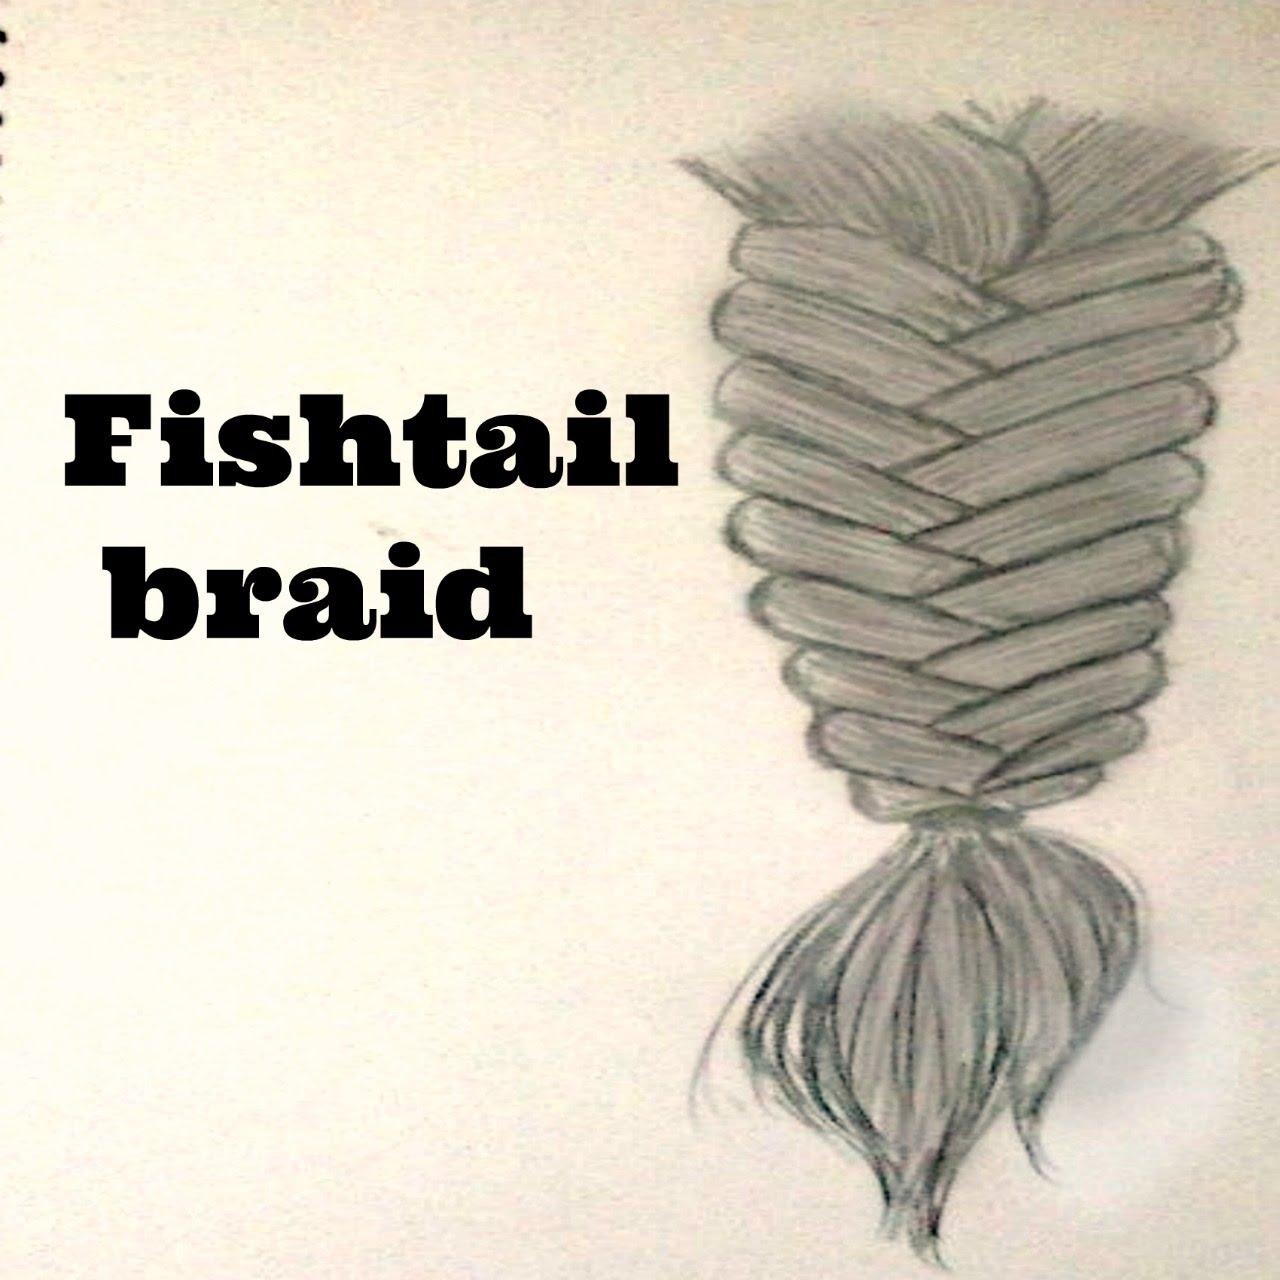 Drawn braid fishtail braid Unsubscribe Fishtail to YouTube draw